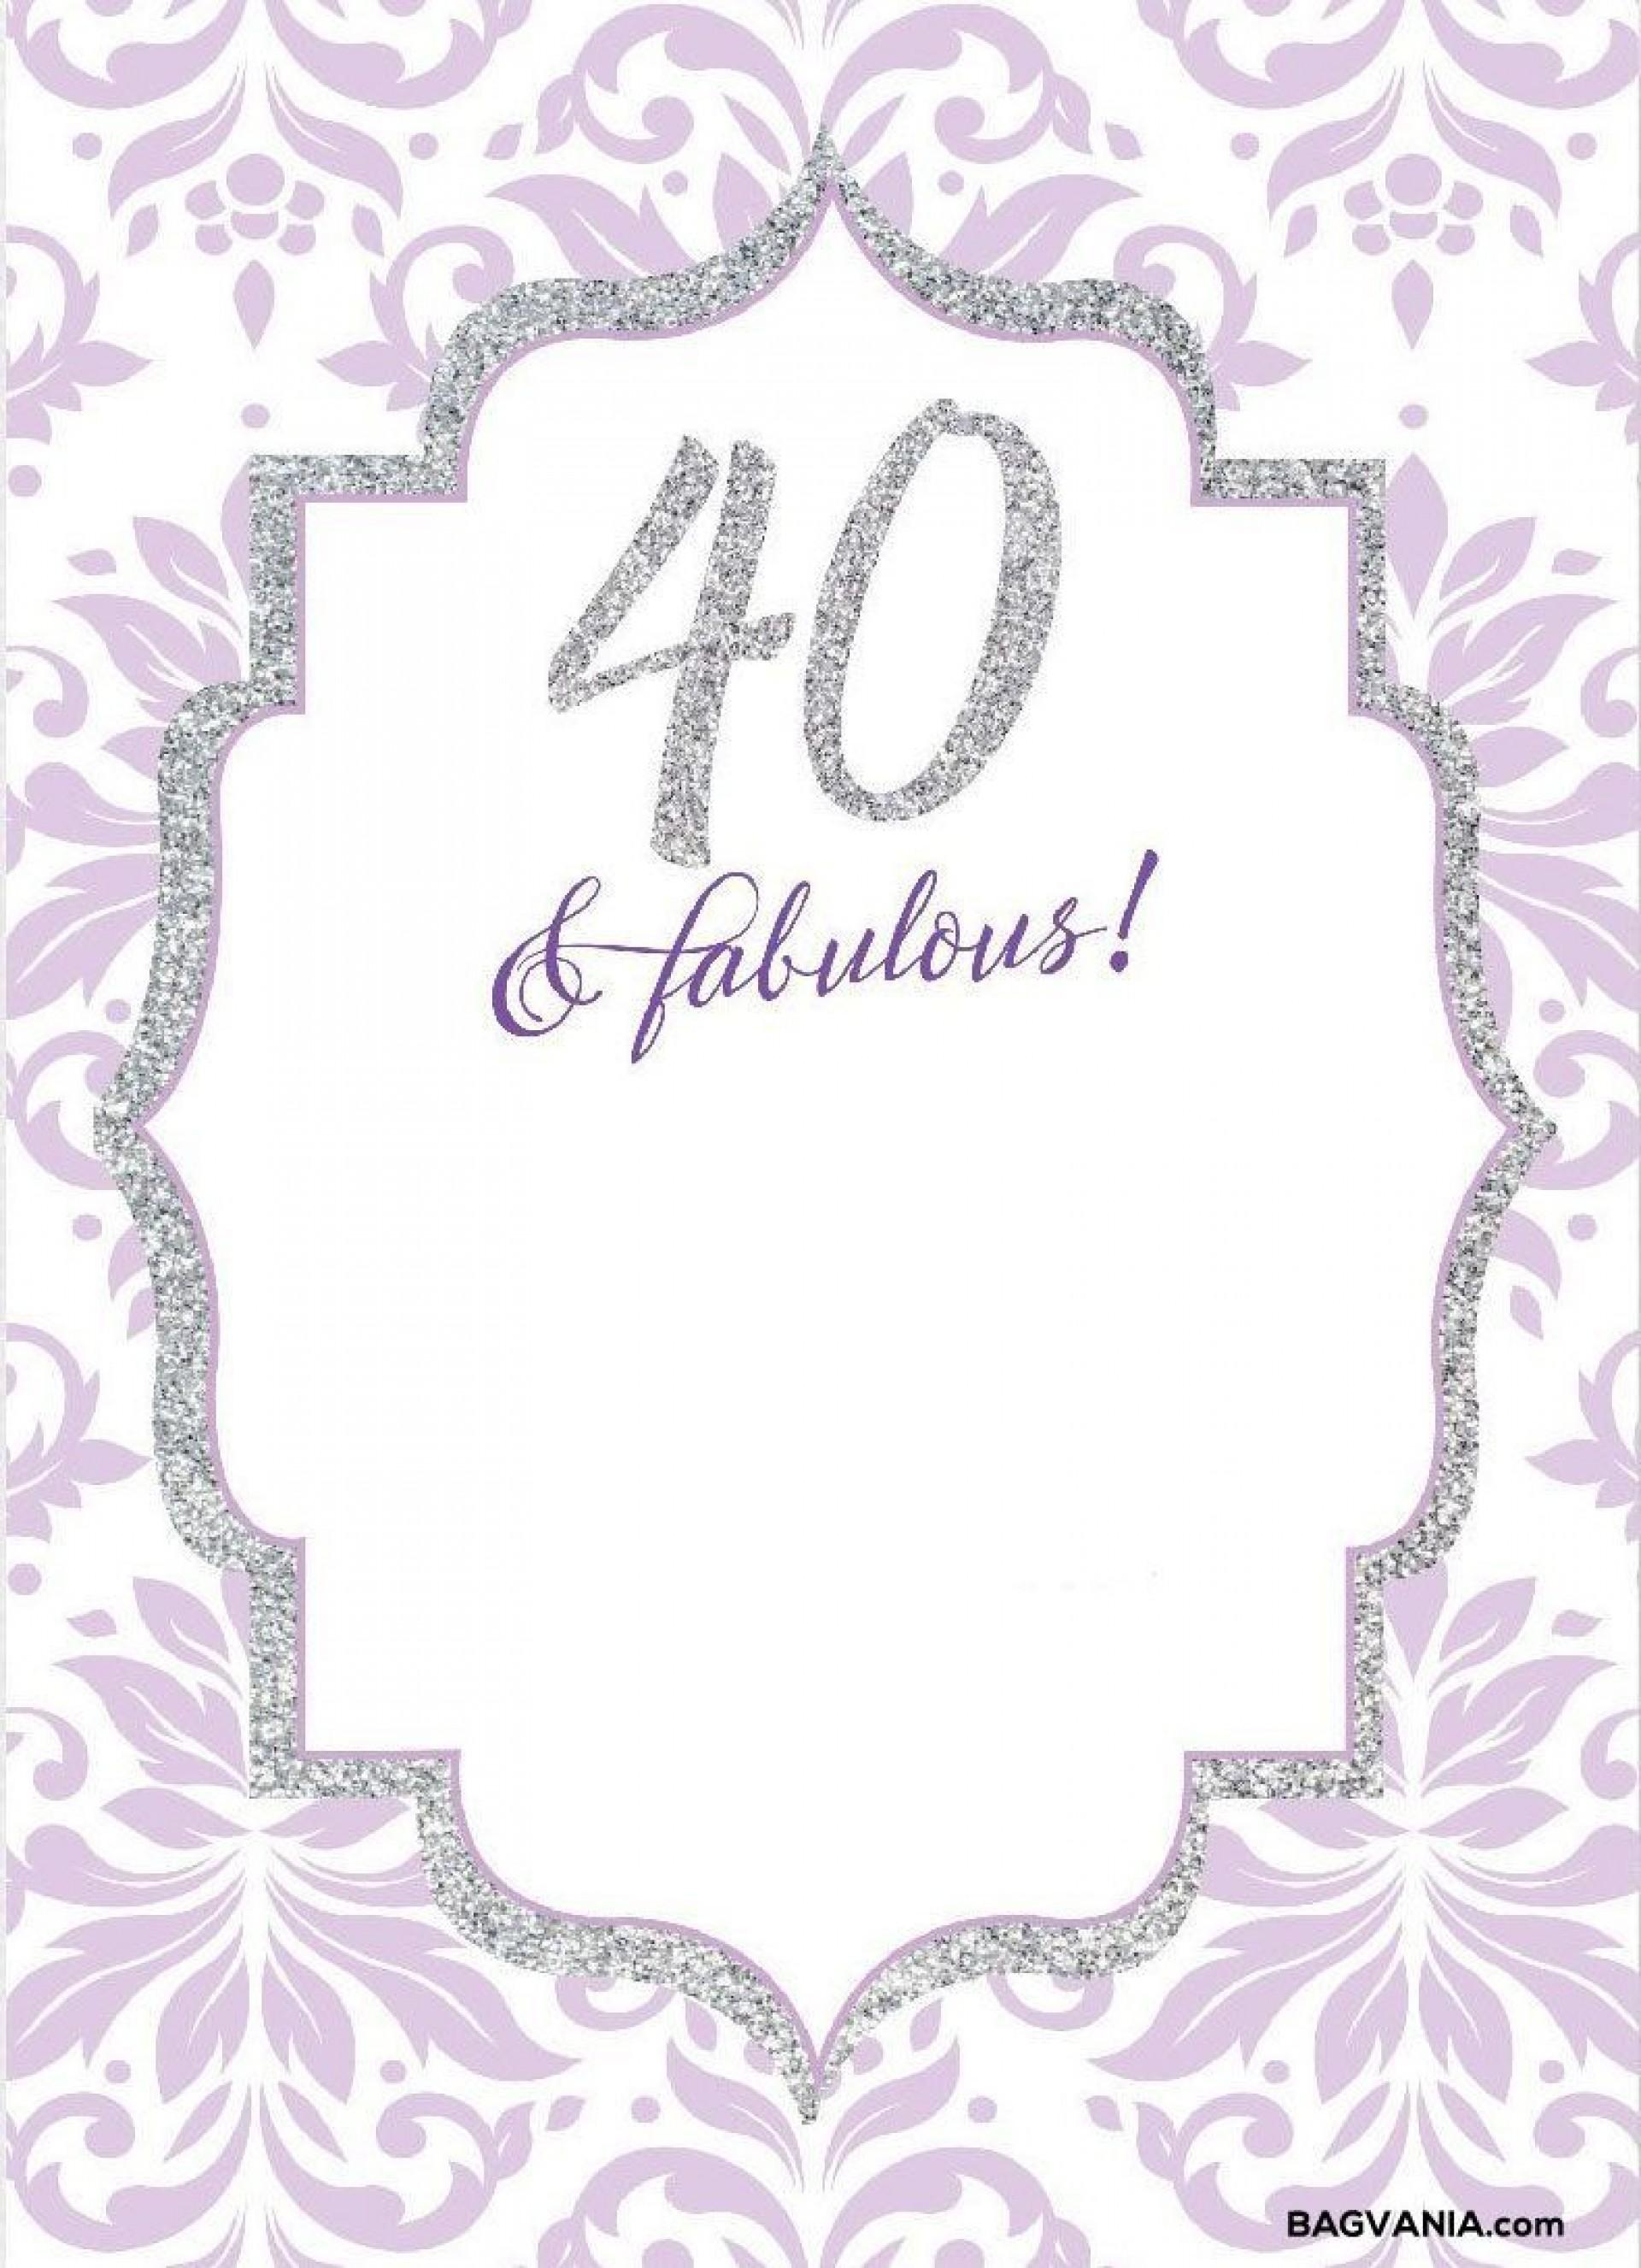 008 Wonderful 40th Birthday Party Invite Template Free Idea 1920